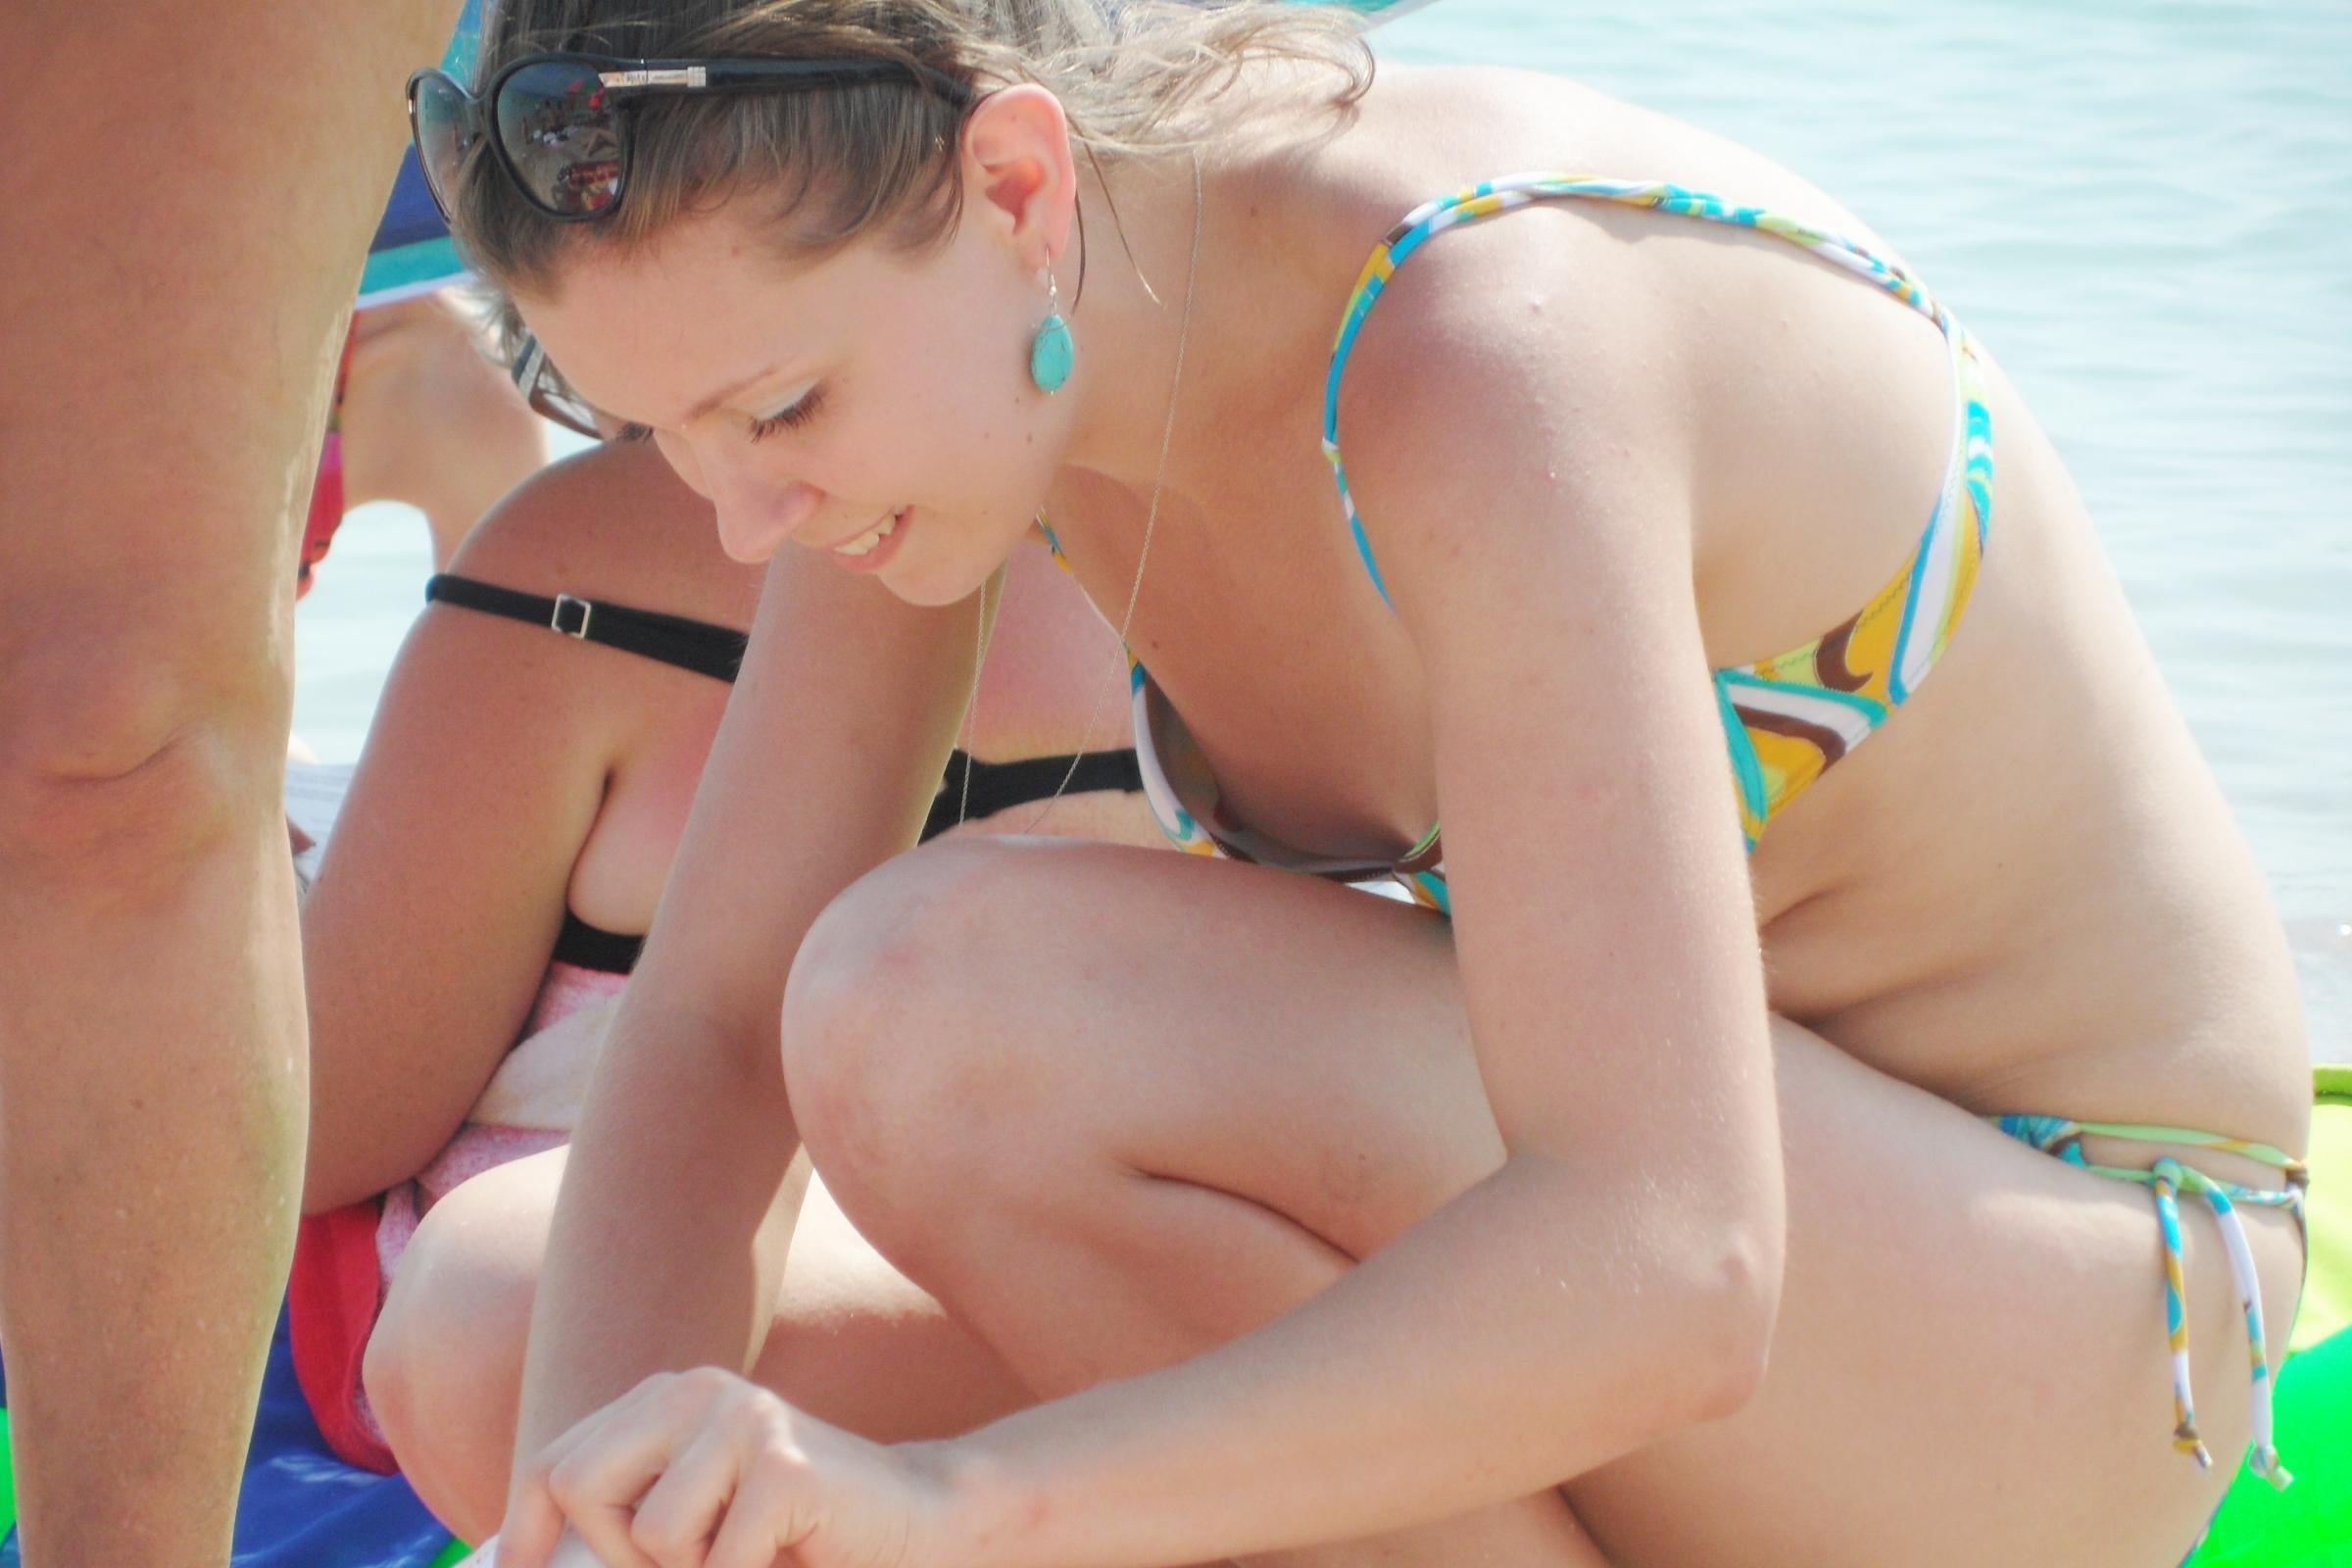 pics-teen-beach-downblouse-bikini-slips-sexy-nude-movies